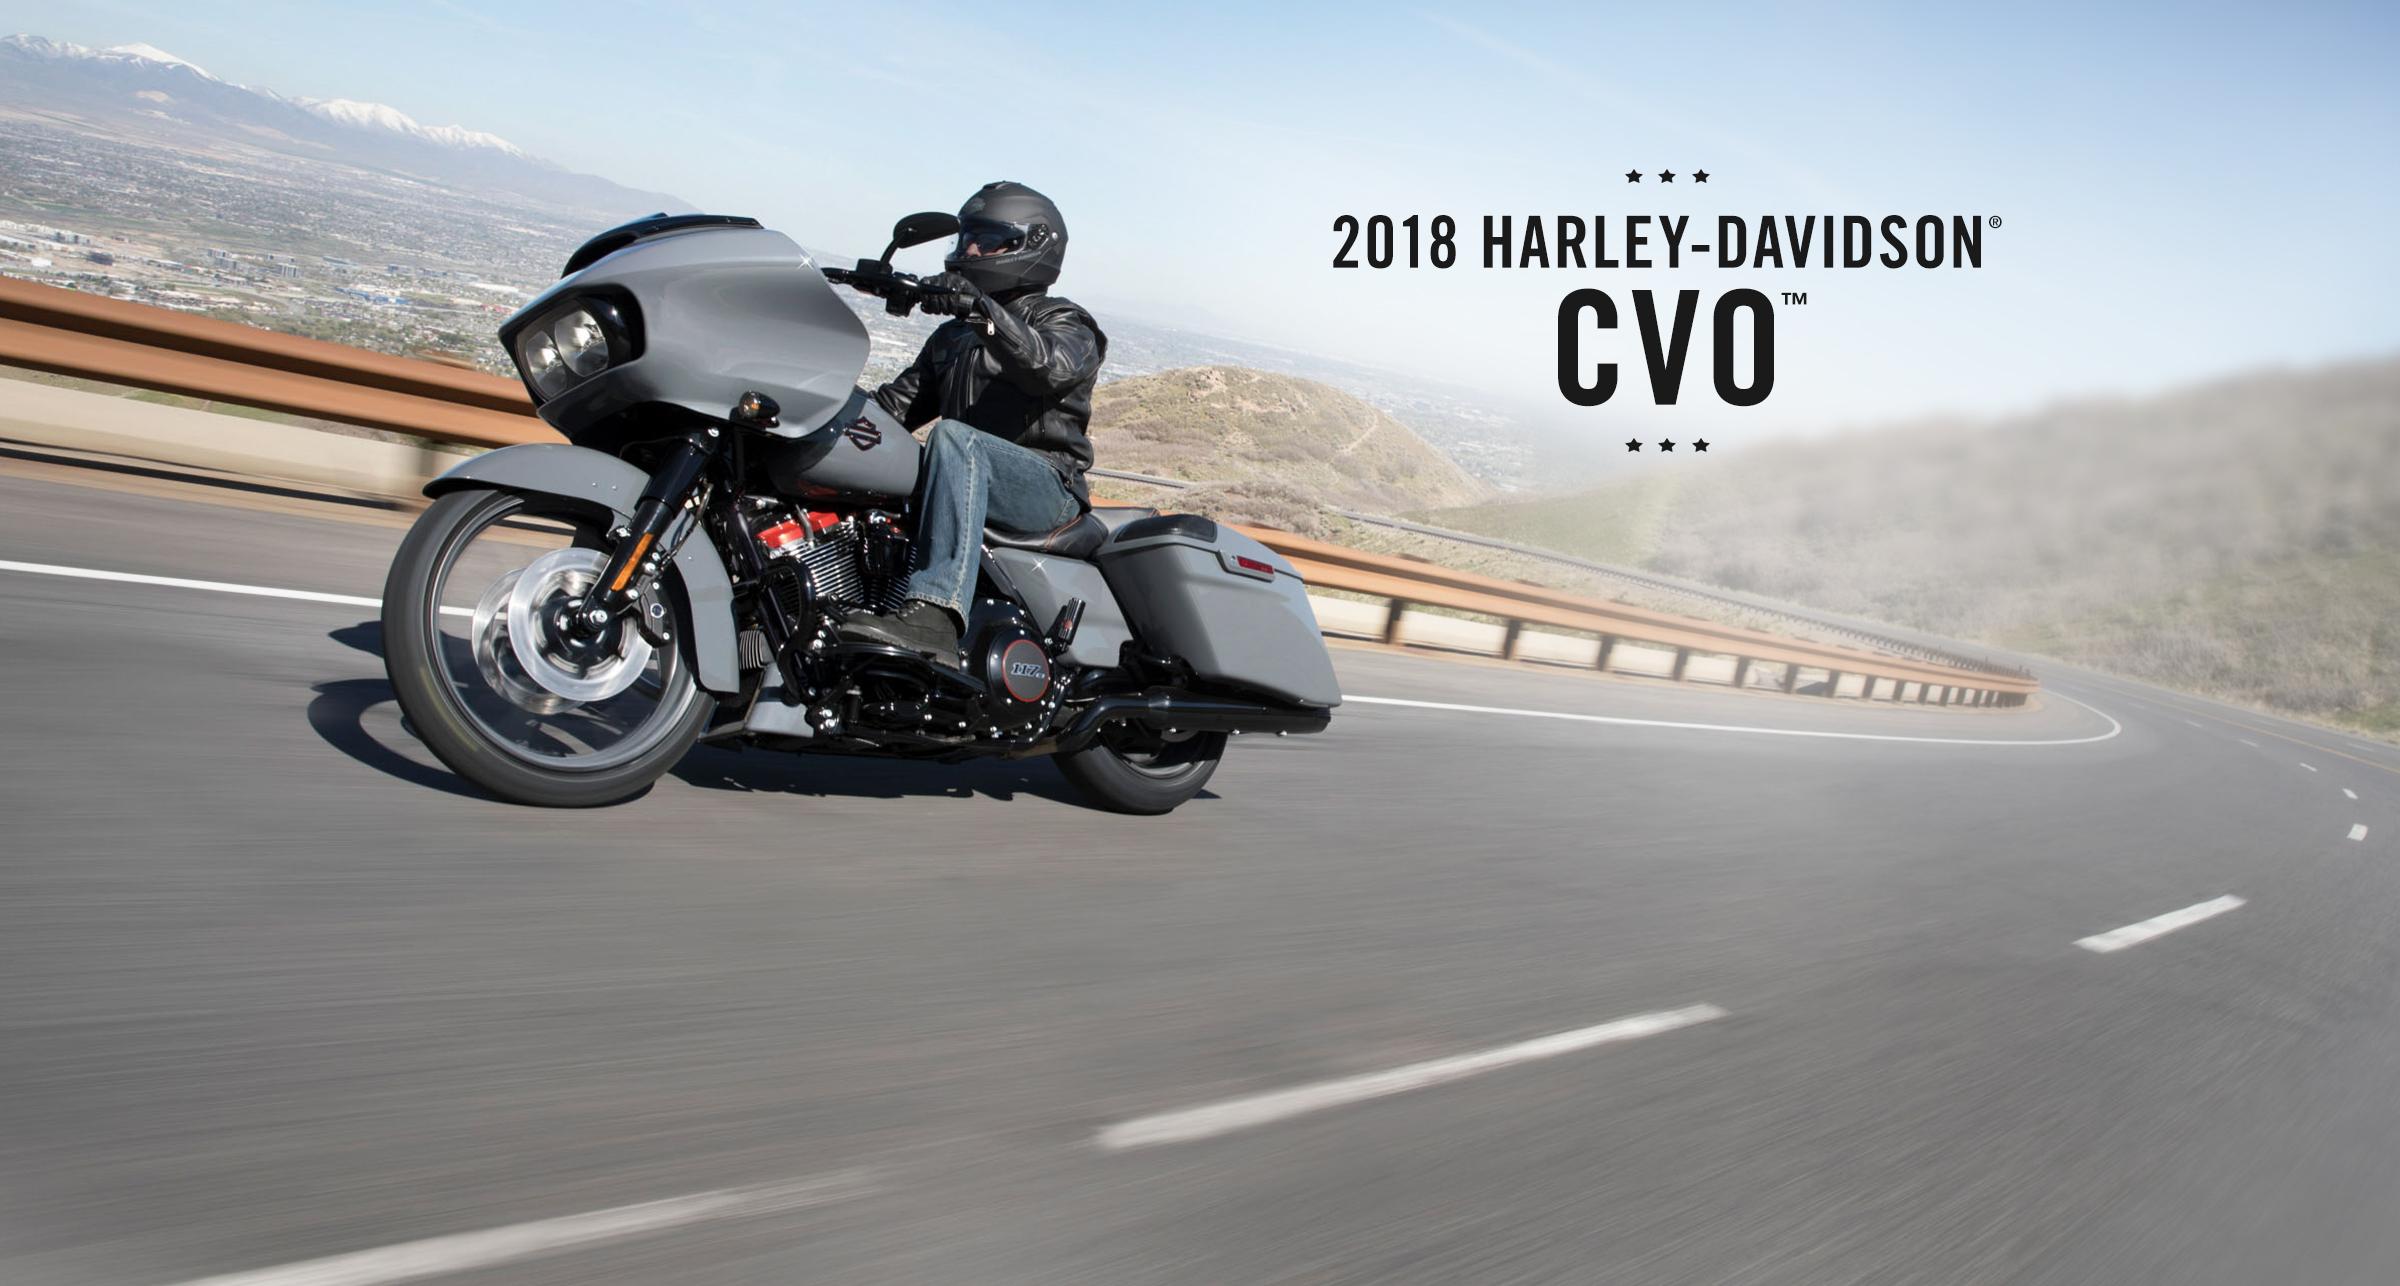 CVO™ - รถมอเตอร์ไซค์ปี 2018